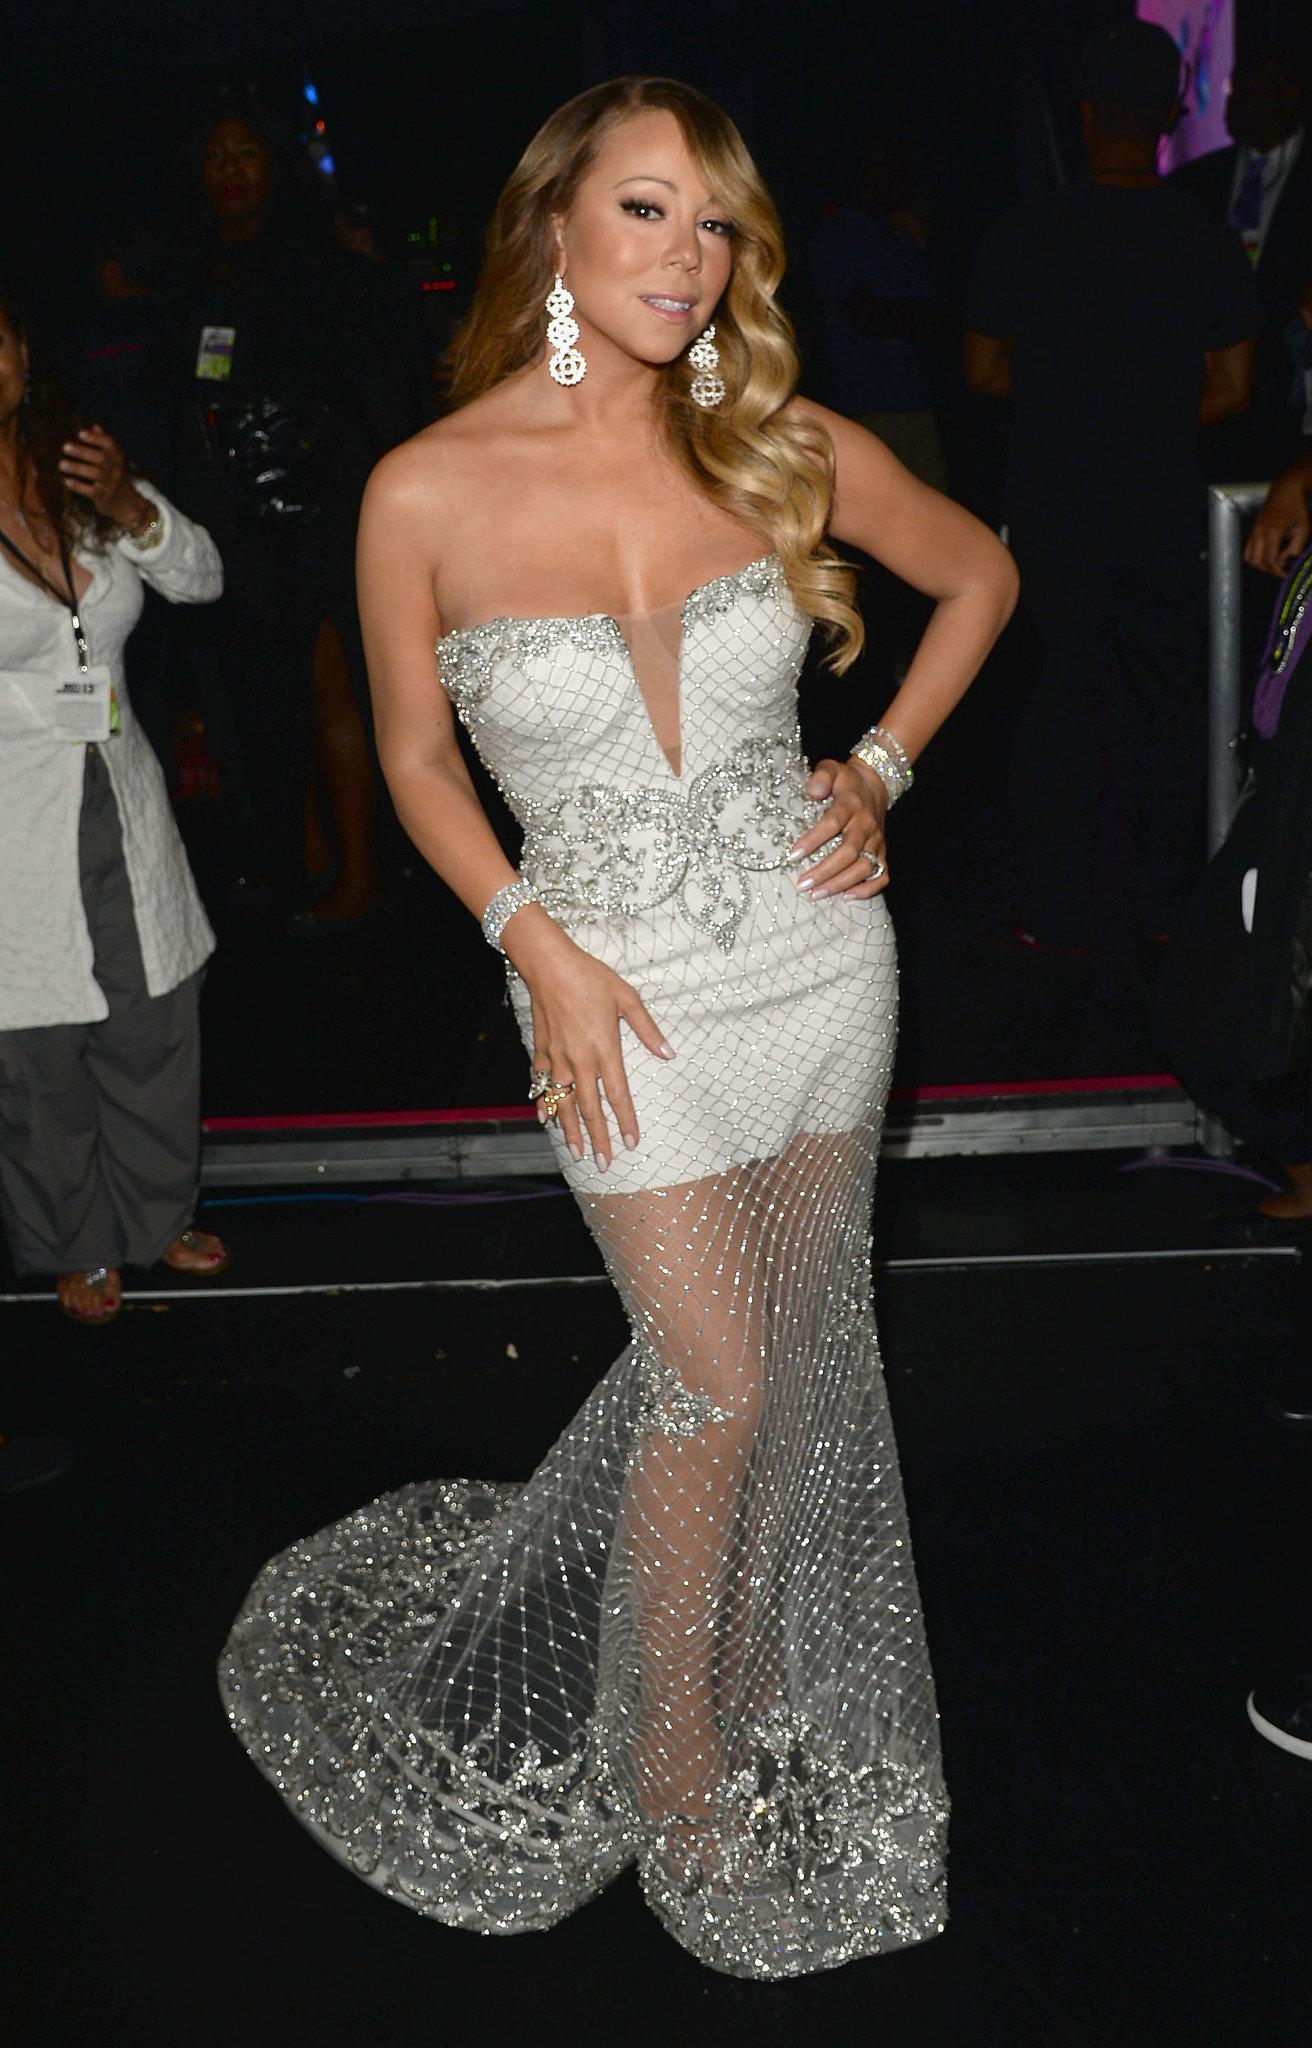 Mariah Carey worked her stuff backstage.